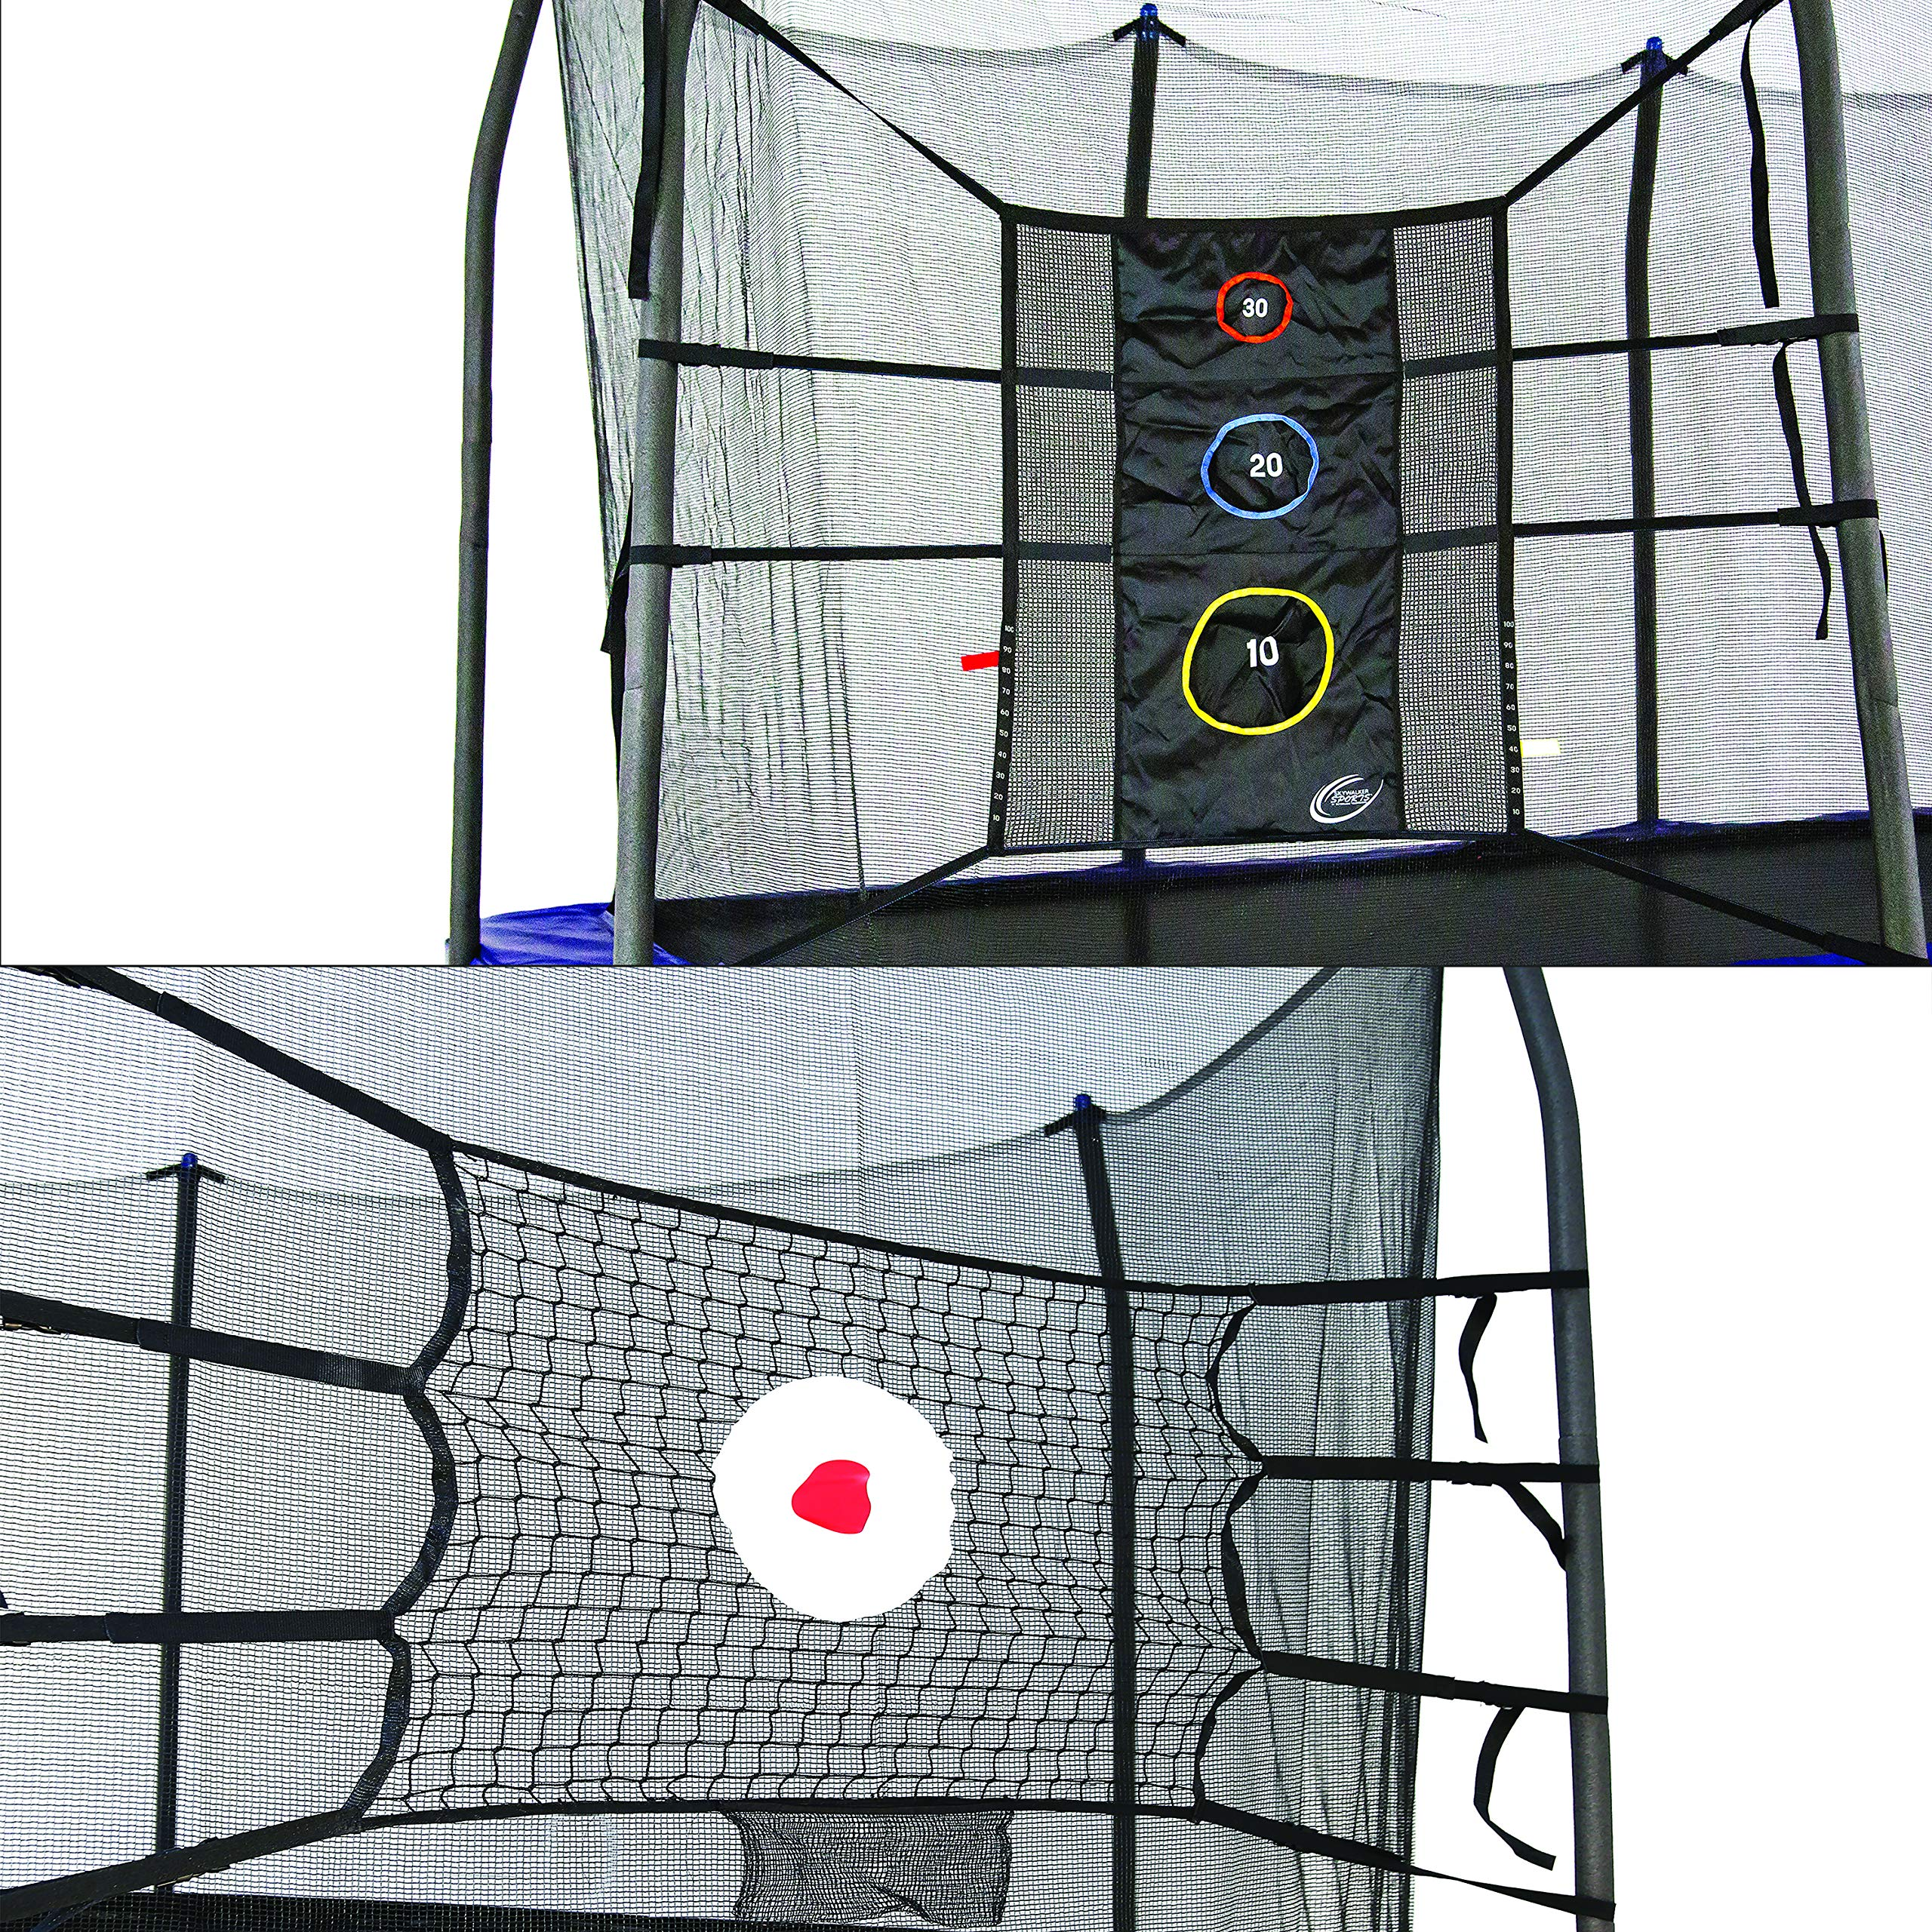 Skywalker Trampolines Game Kit w upper bounce back and triple toss games by Skywalker Trampolines